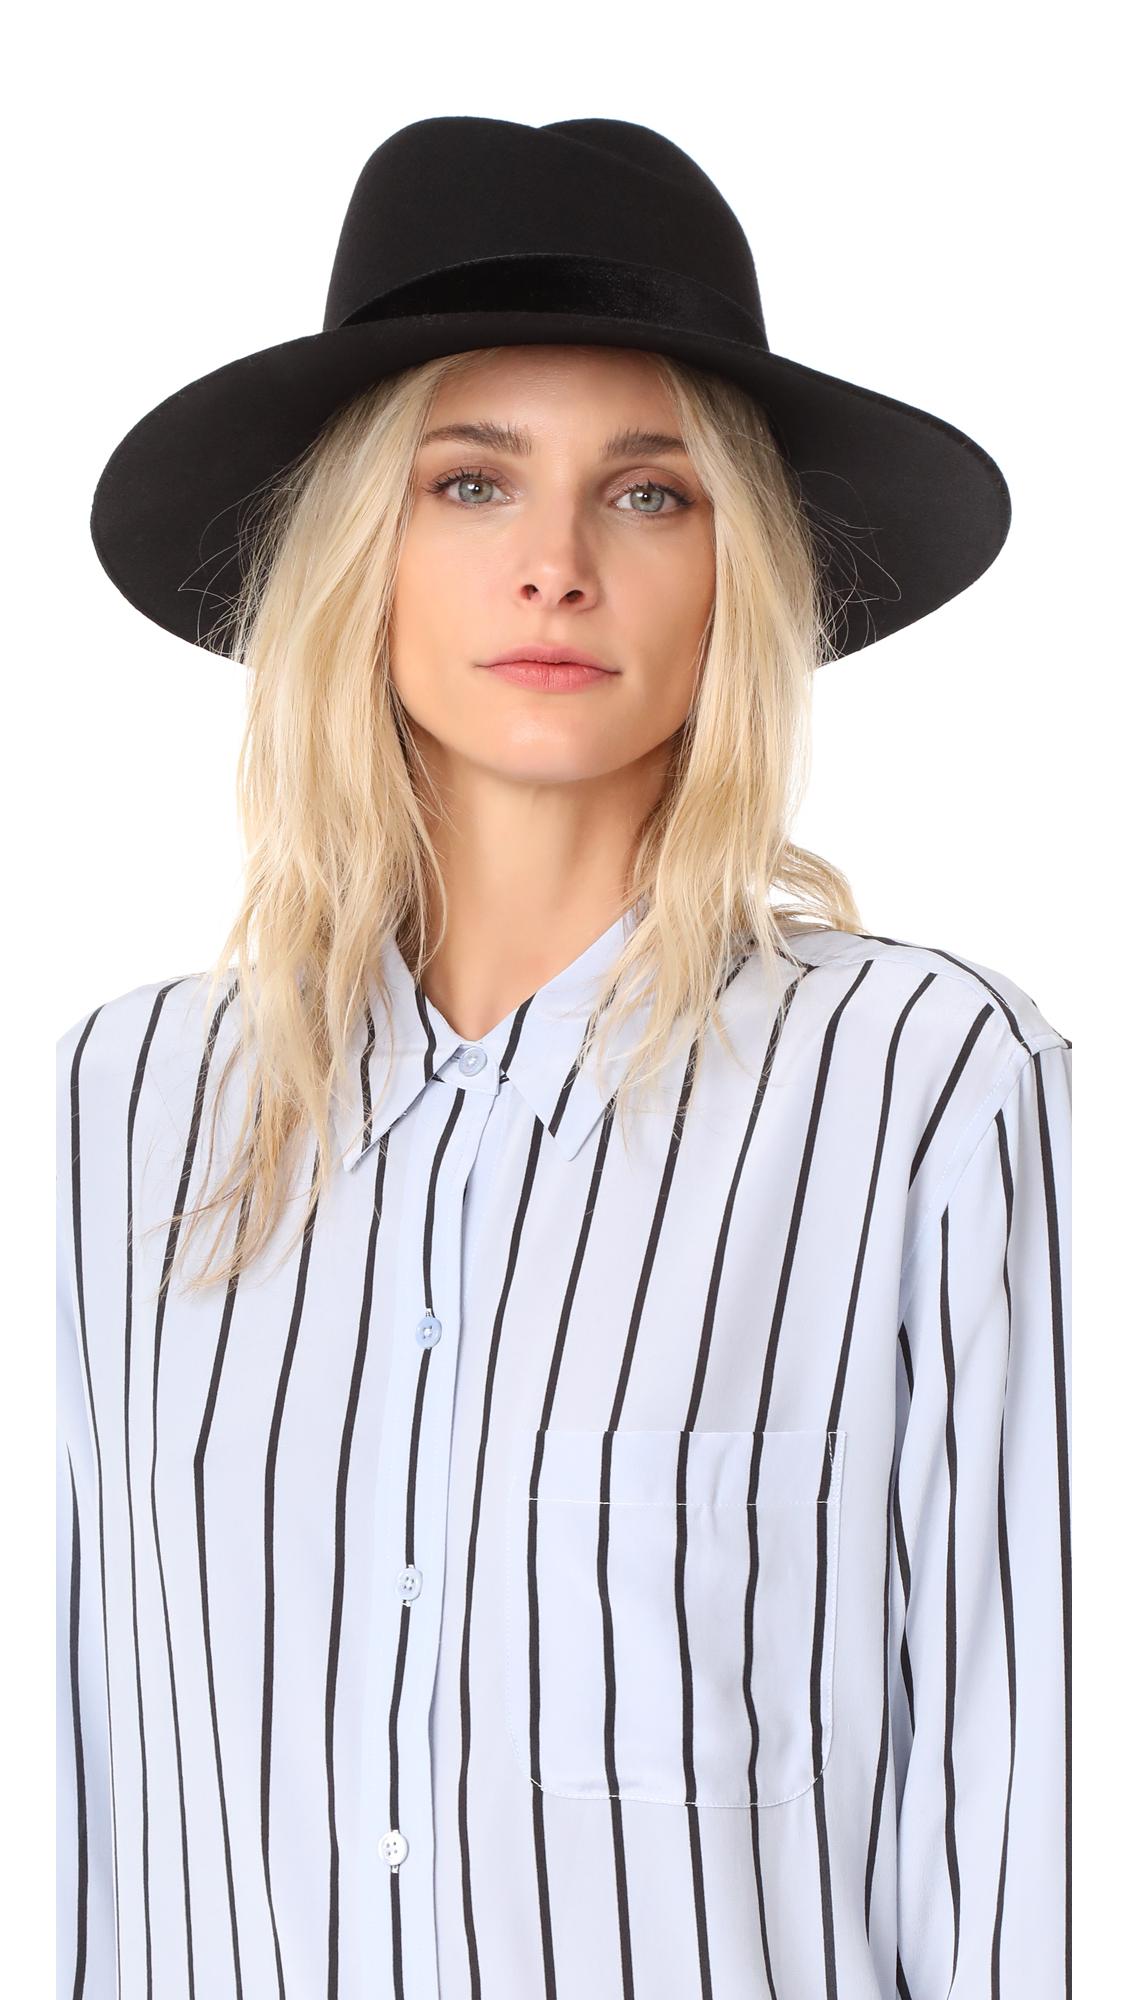 Rag & Bone Zoe Fedora Hat - Black